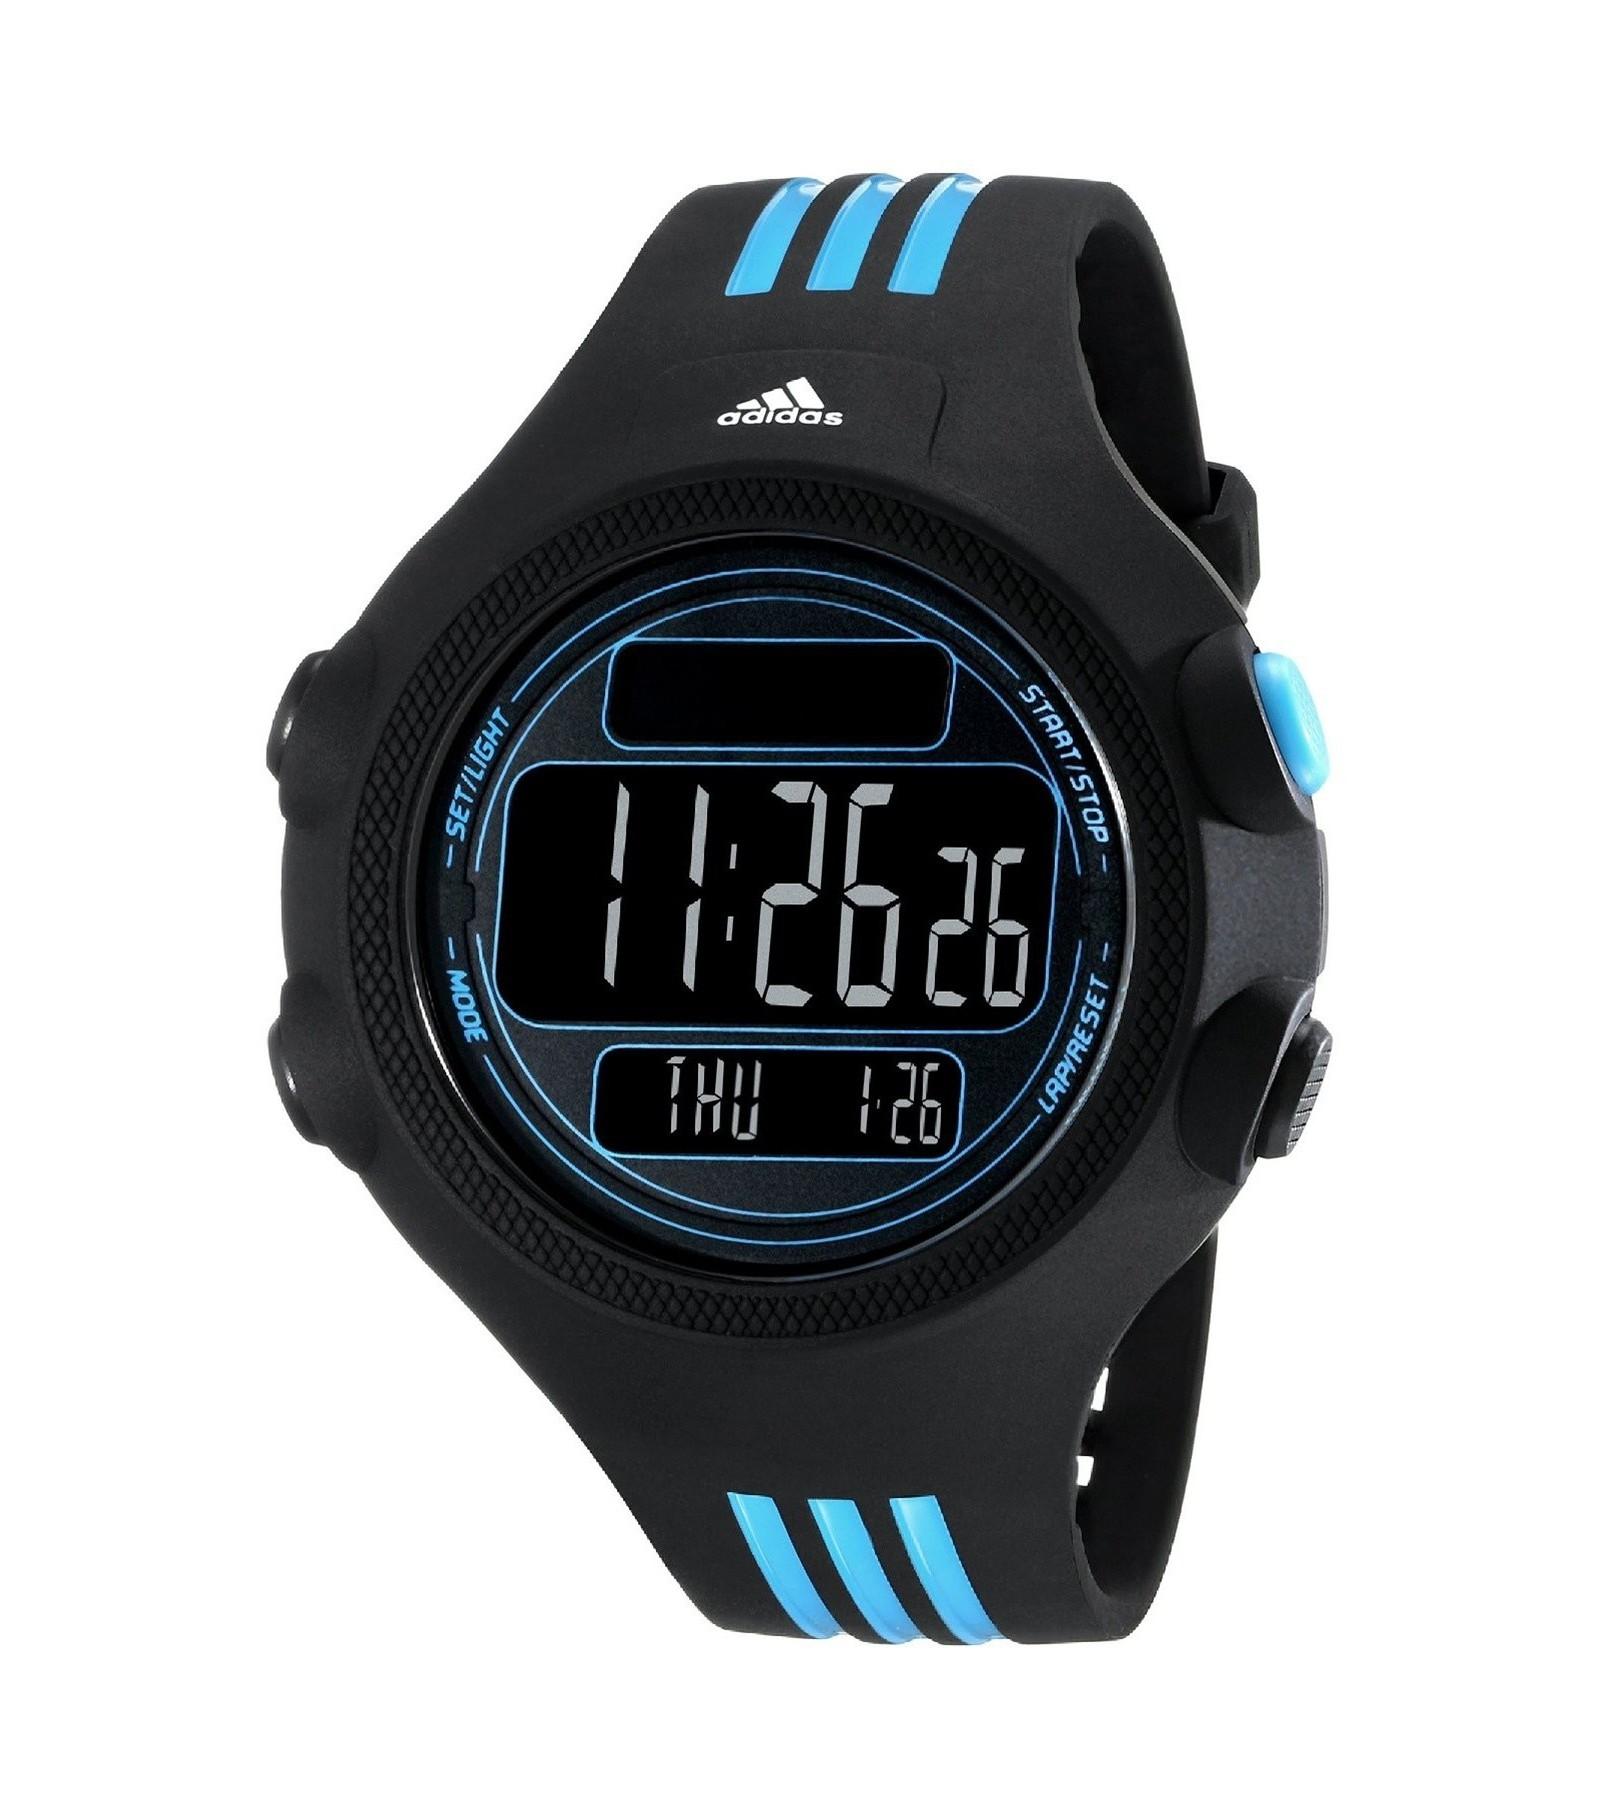 Японские часы Casio - kazan-watchru